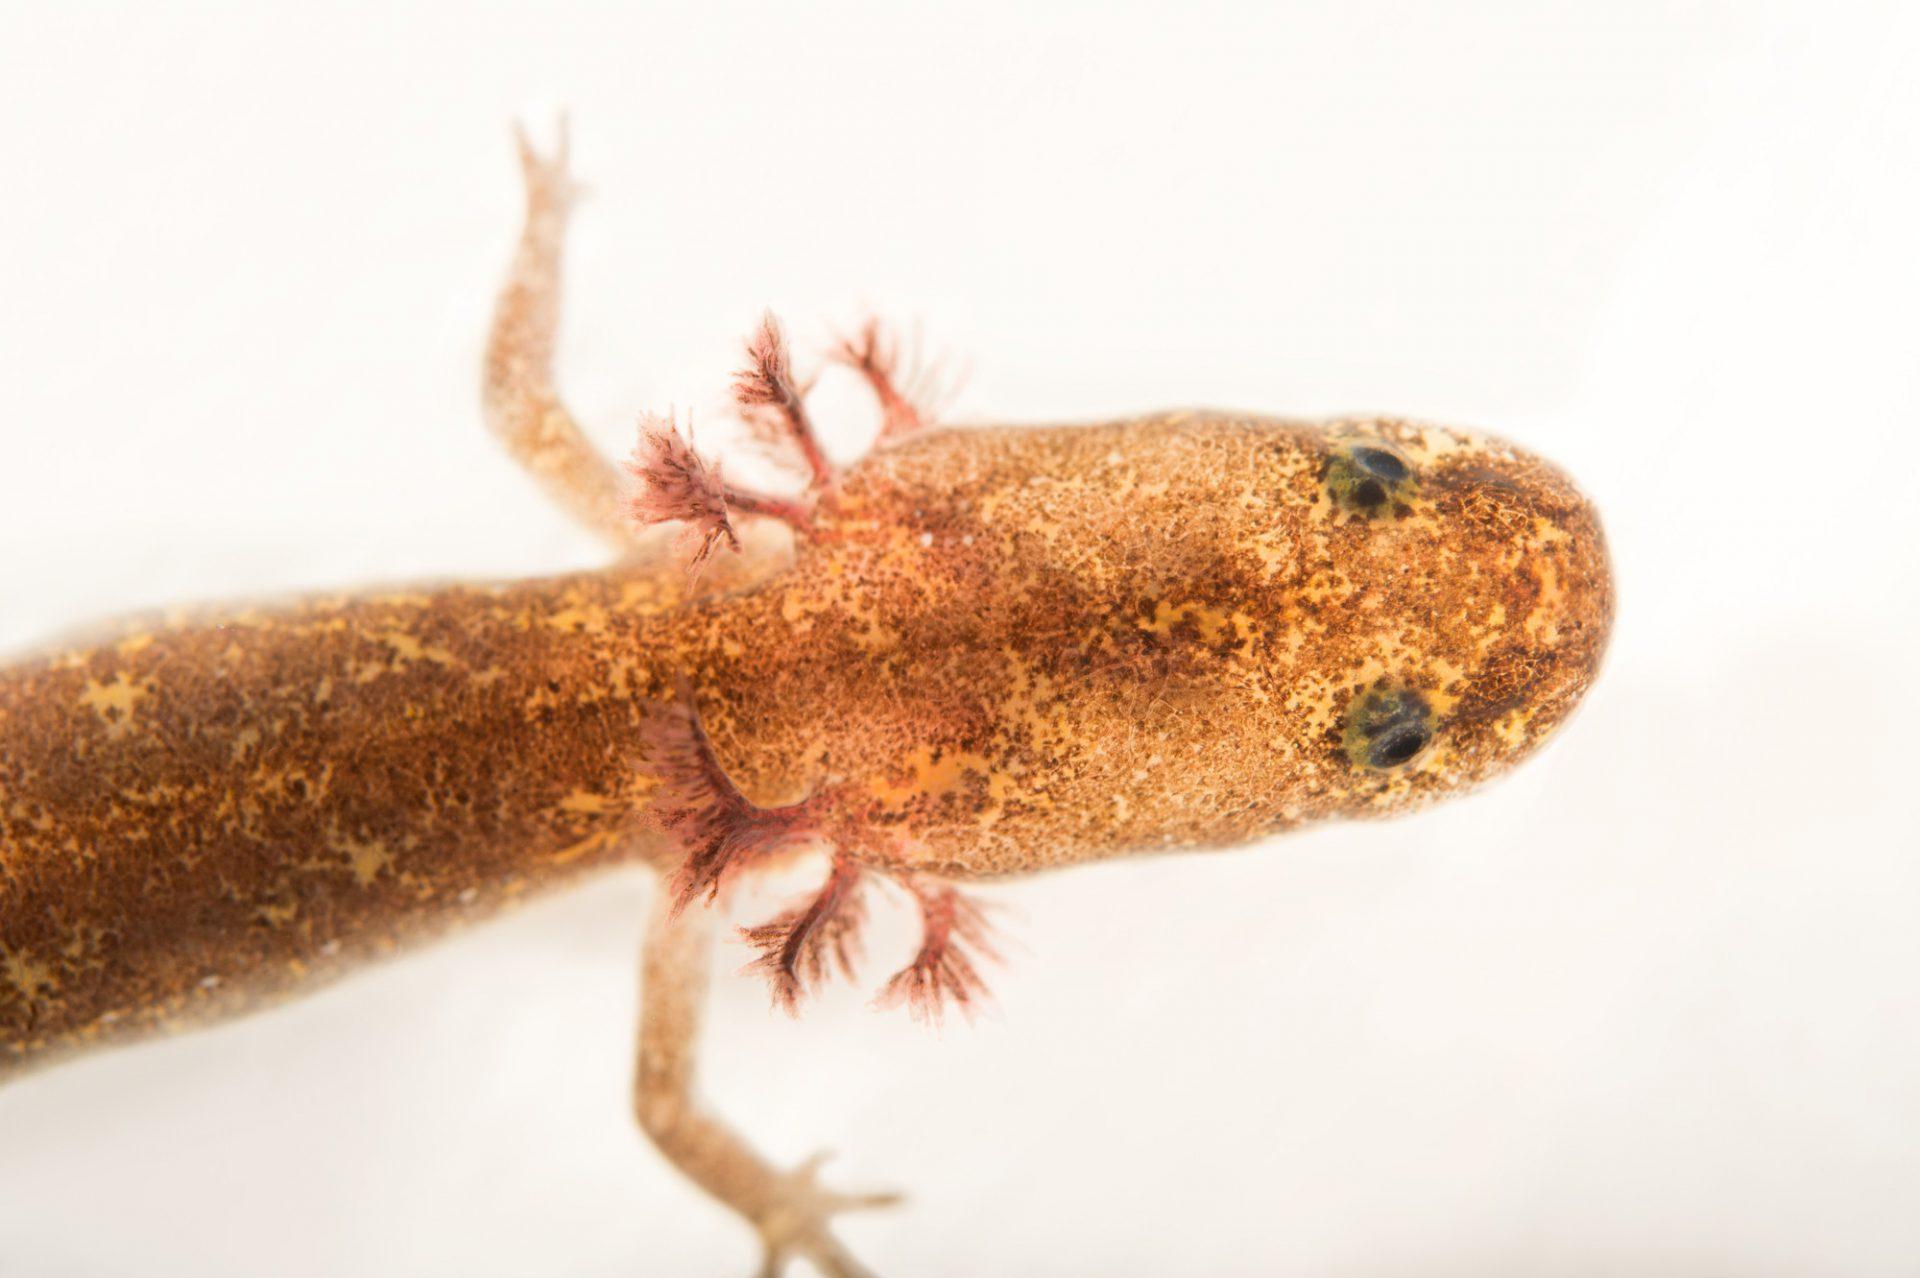 Picture of a vulnerable Salado salamander (Eurycea chisholmensis) at the Dallas Zoo.